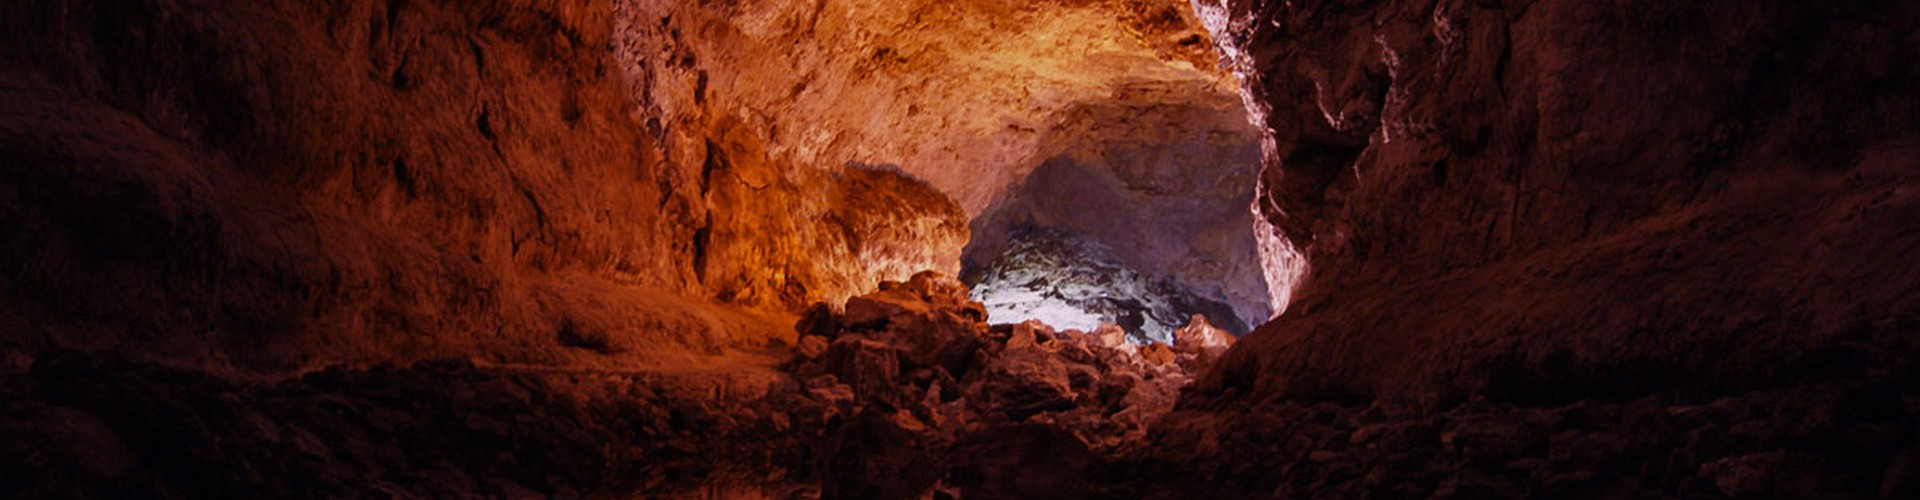 Cueva de los Verdes (Credit: Marta Umbert Ceresuela, distributed via imaggeo.egu.eu)